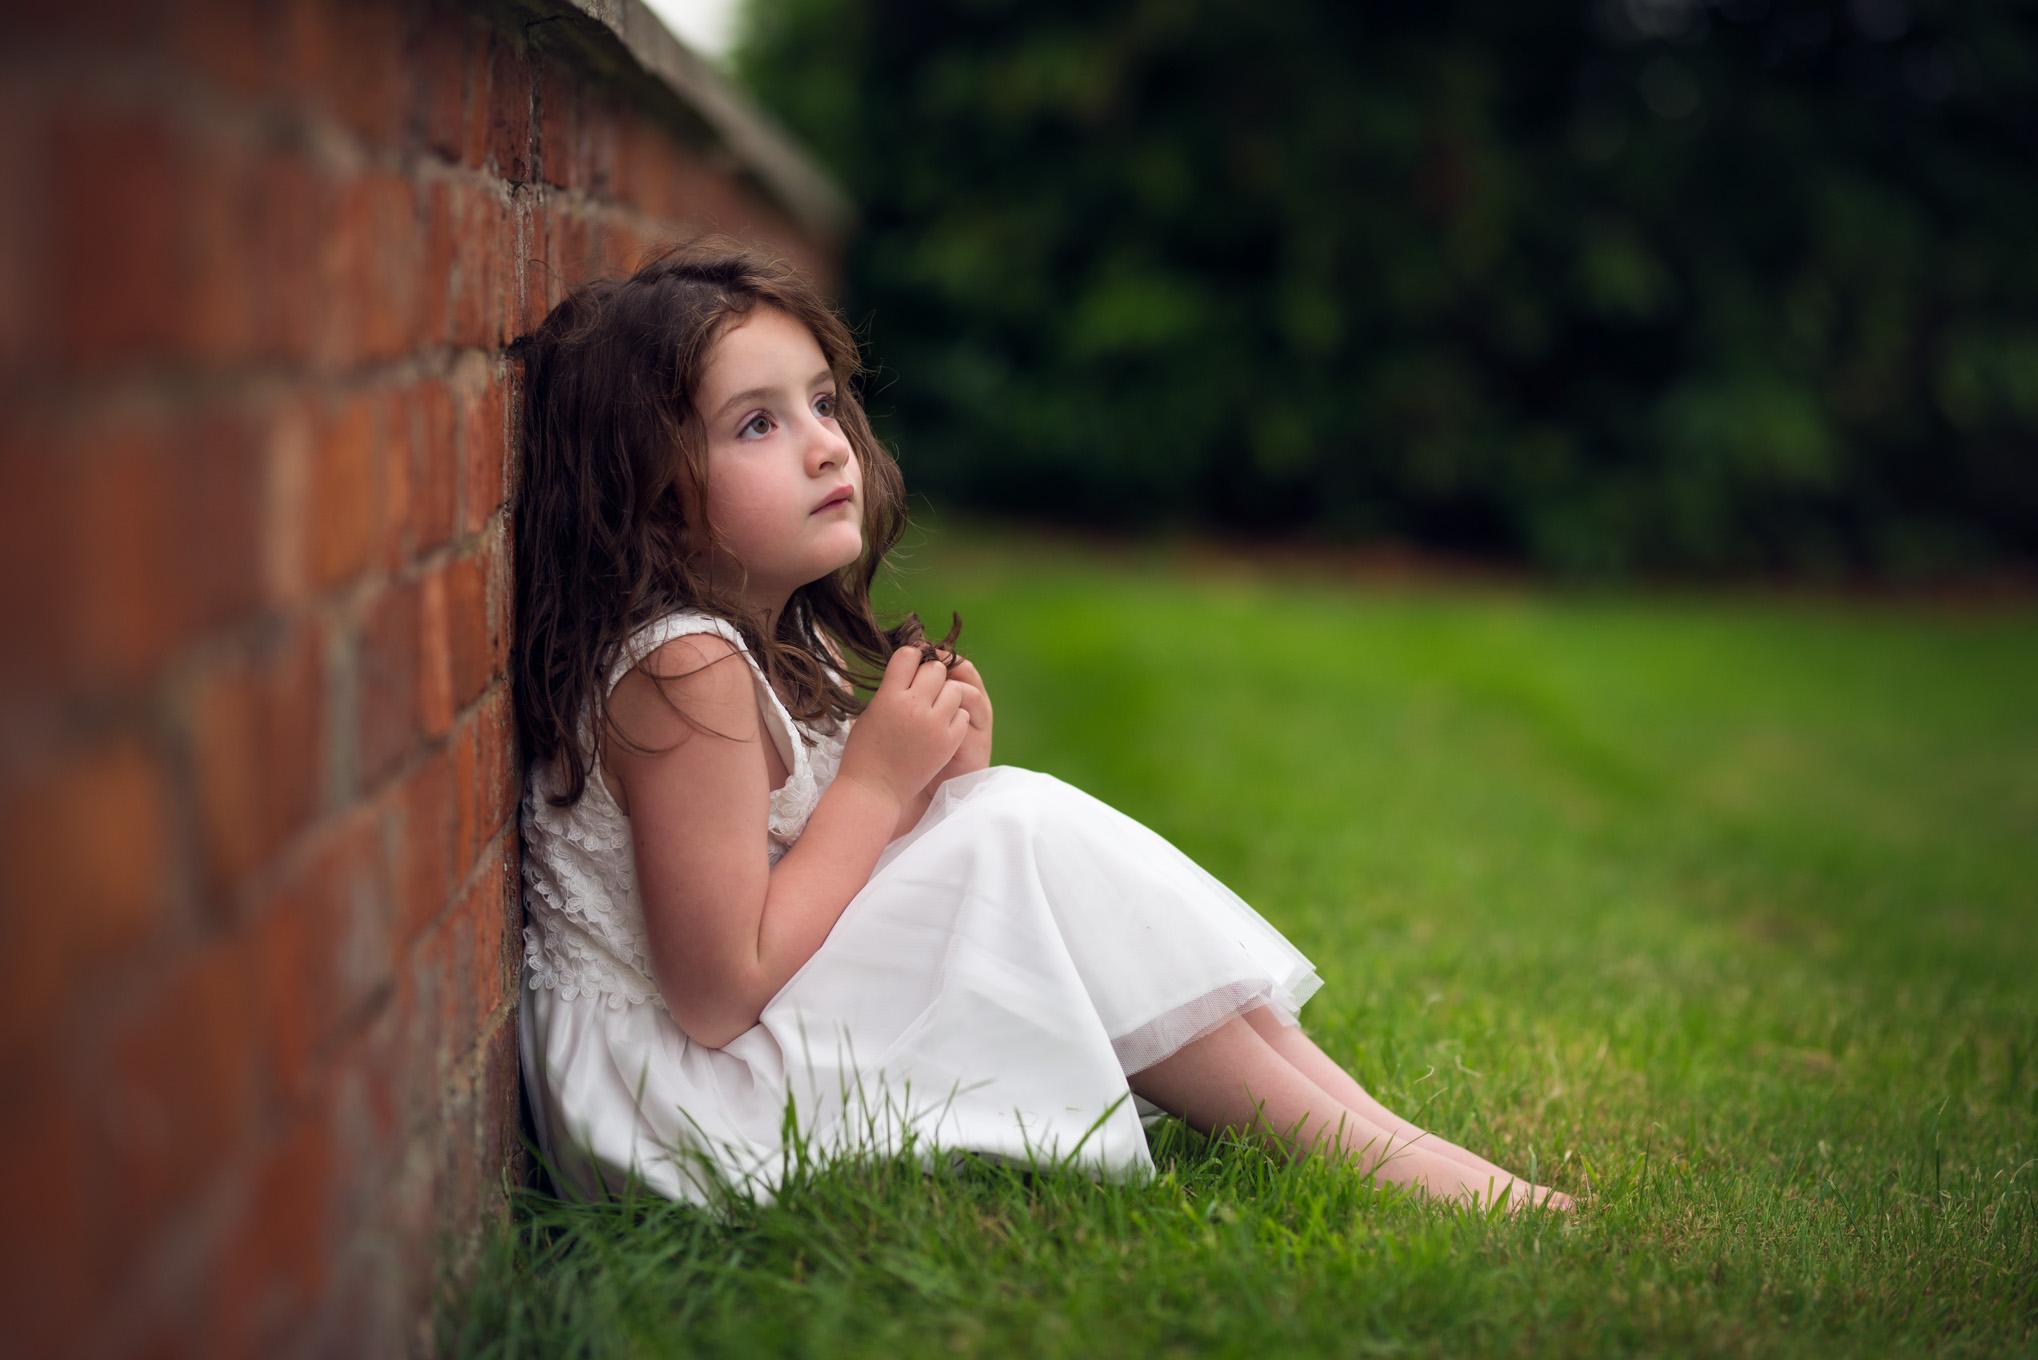 Girl in white dress sat against wall | Children's Photography